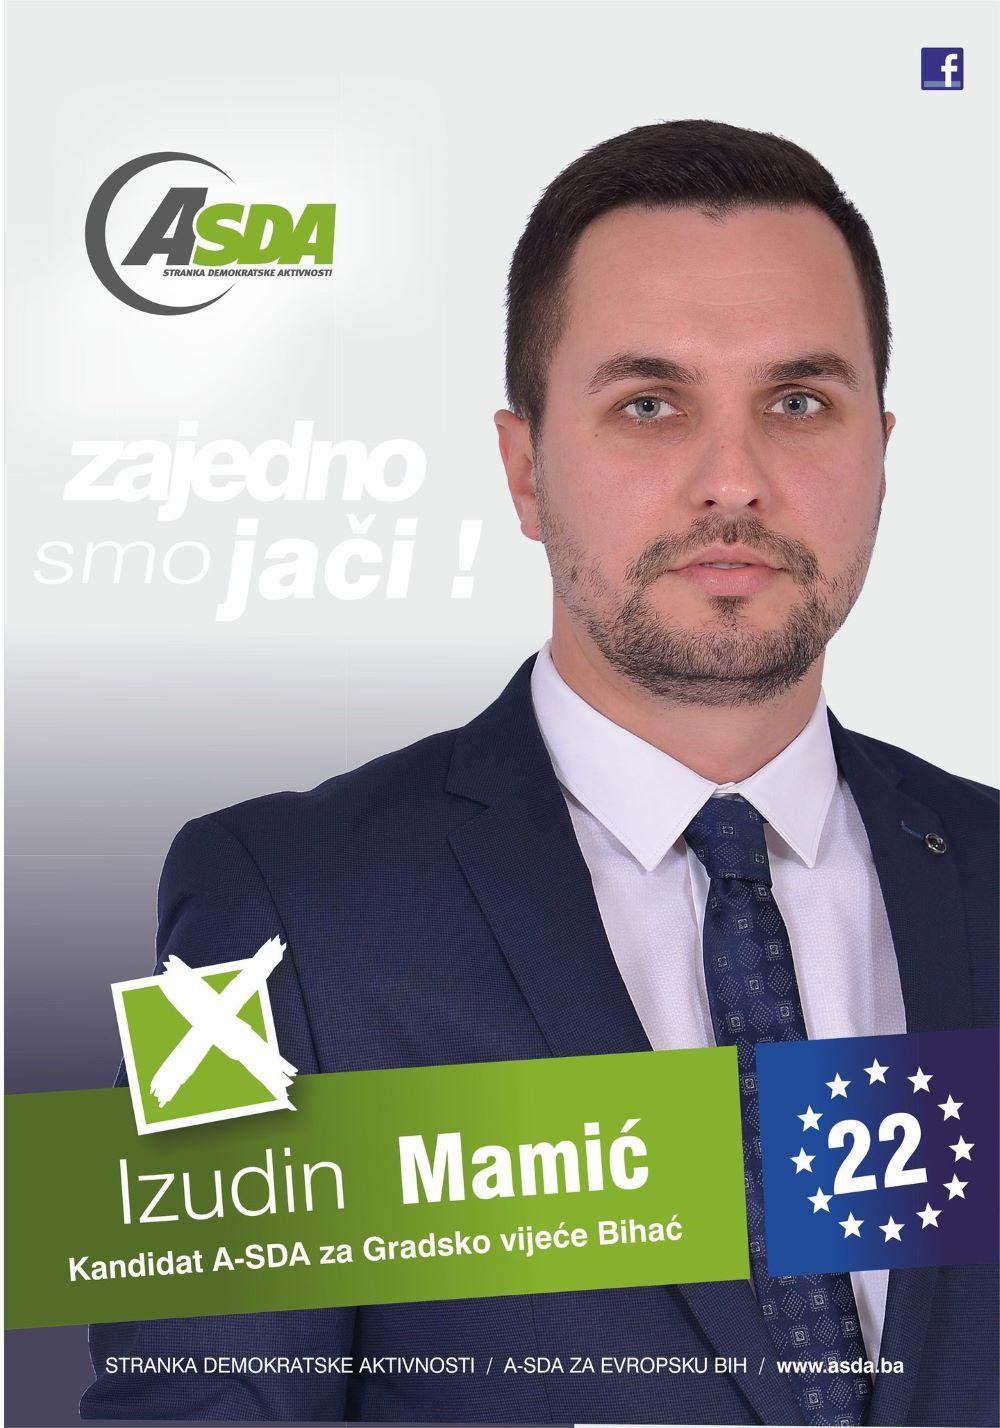 Izudin Mamić